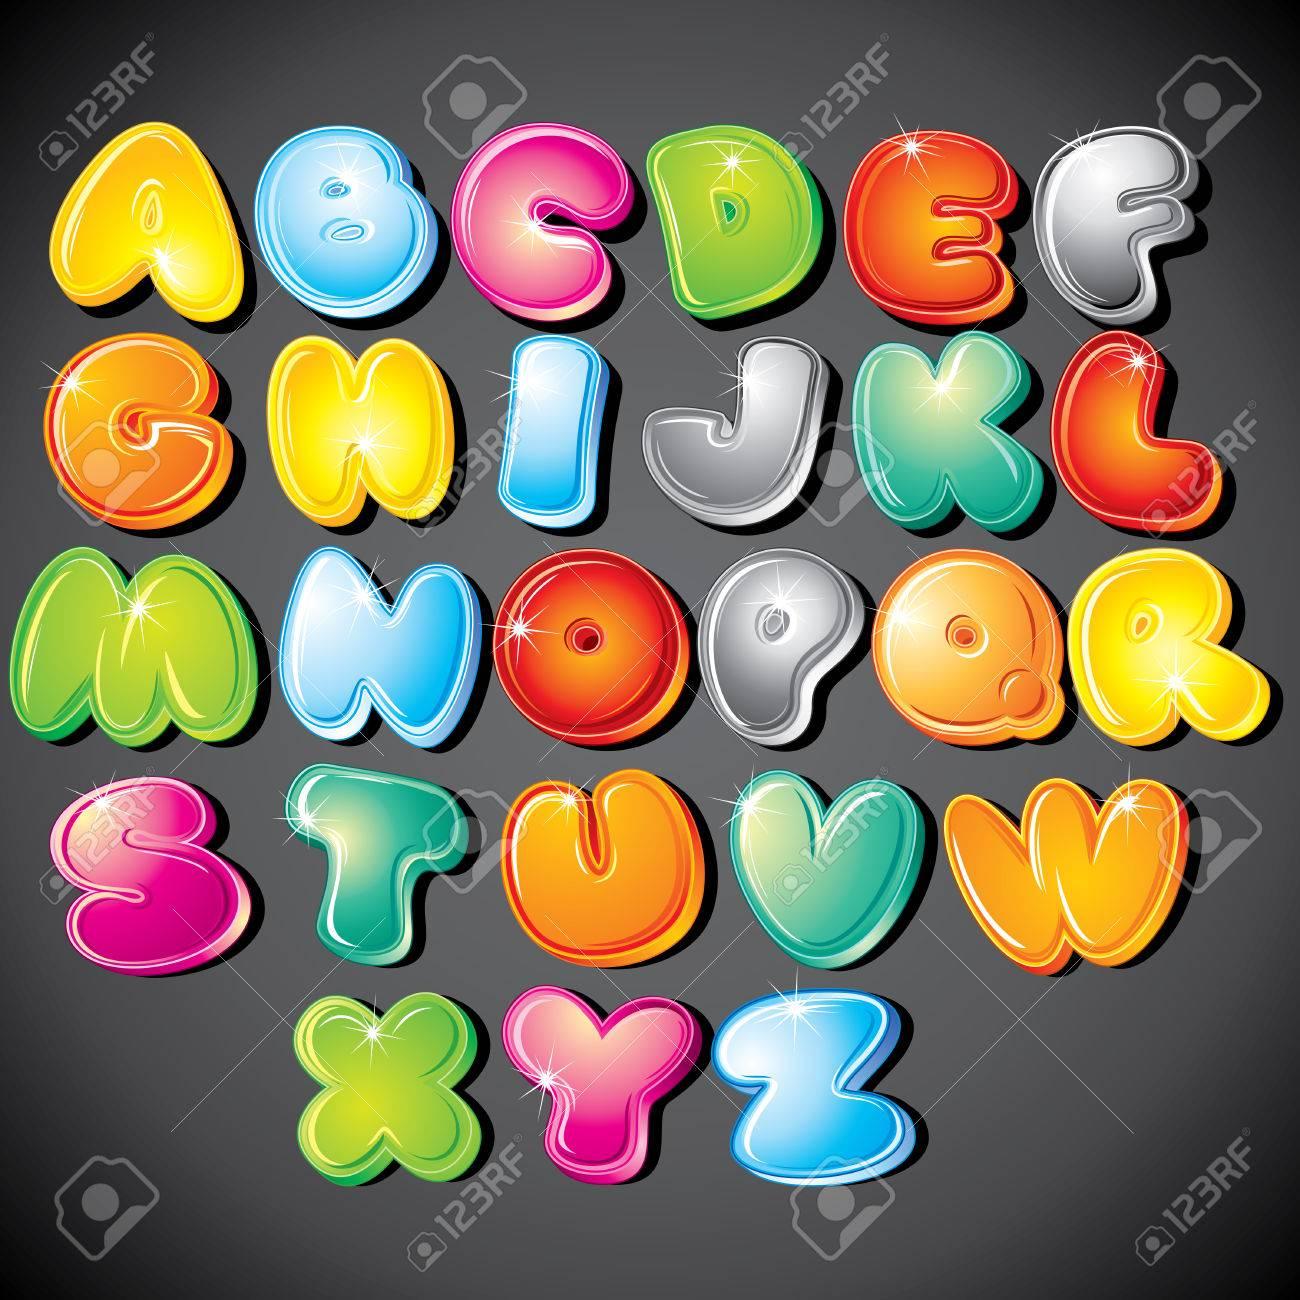 Joyful Cartoon font type - letter from A to Z,   clip art Stock Vector - 8186161